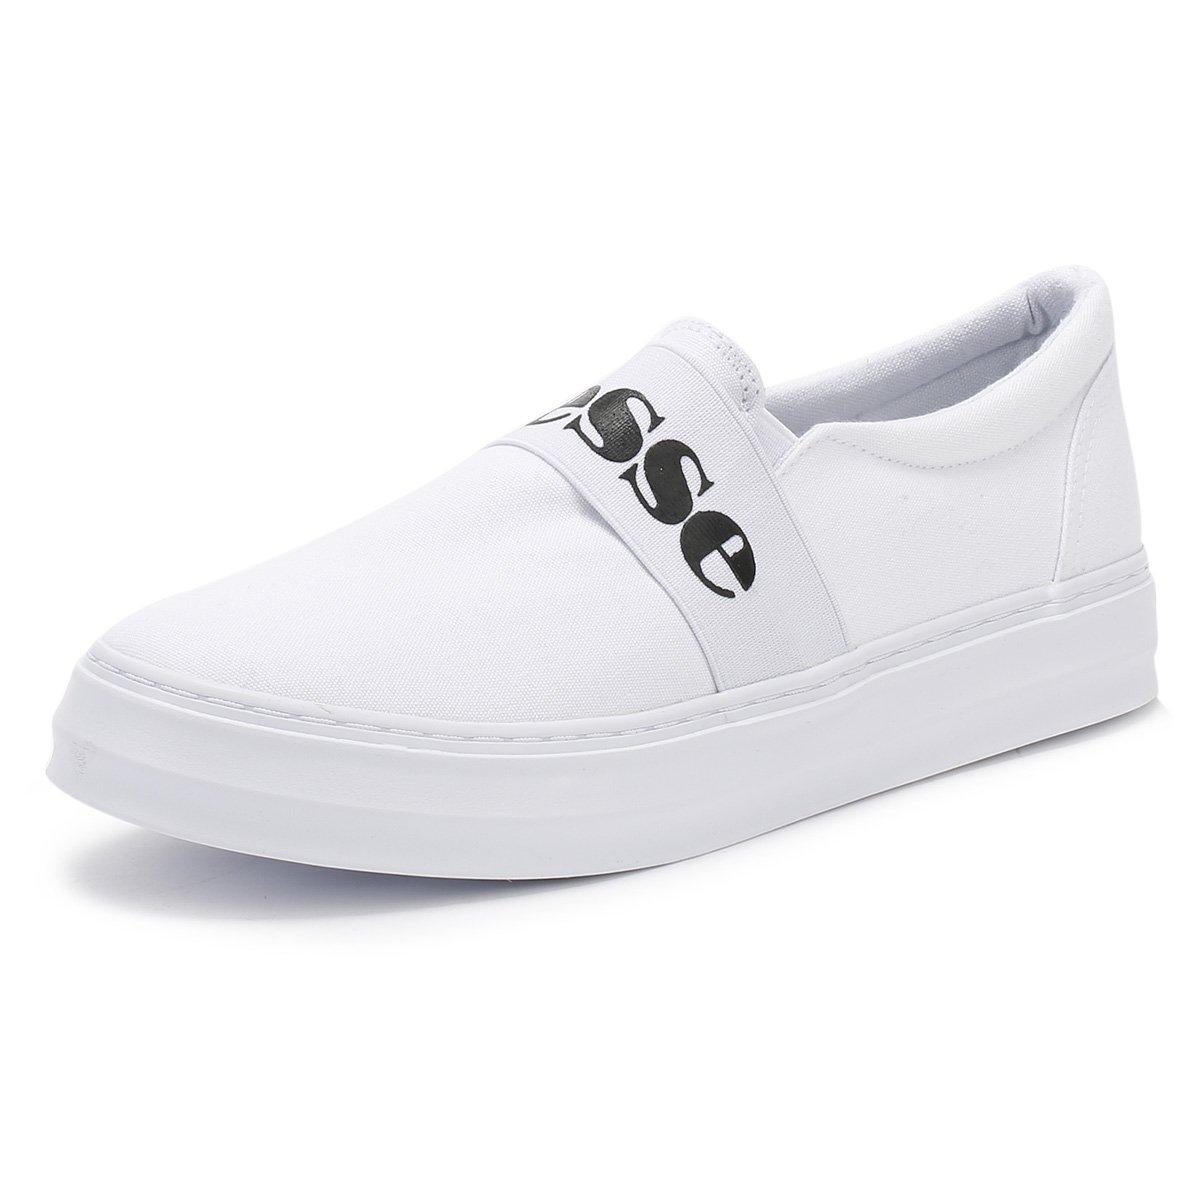 3d860a85 Ellesse Womens White/Black Panforte Trainers-UK 5: Amazon.co.uk ...